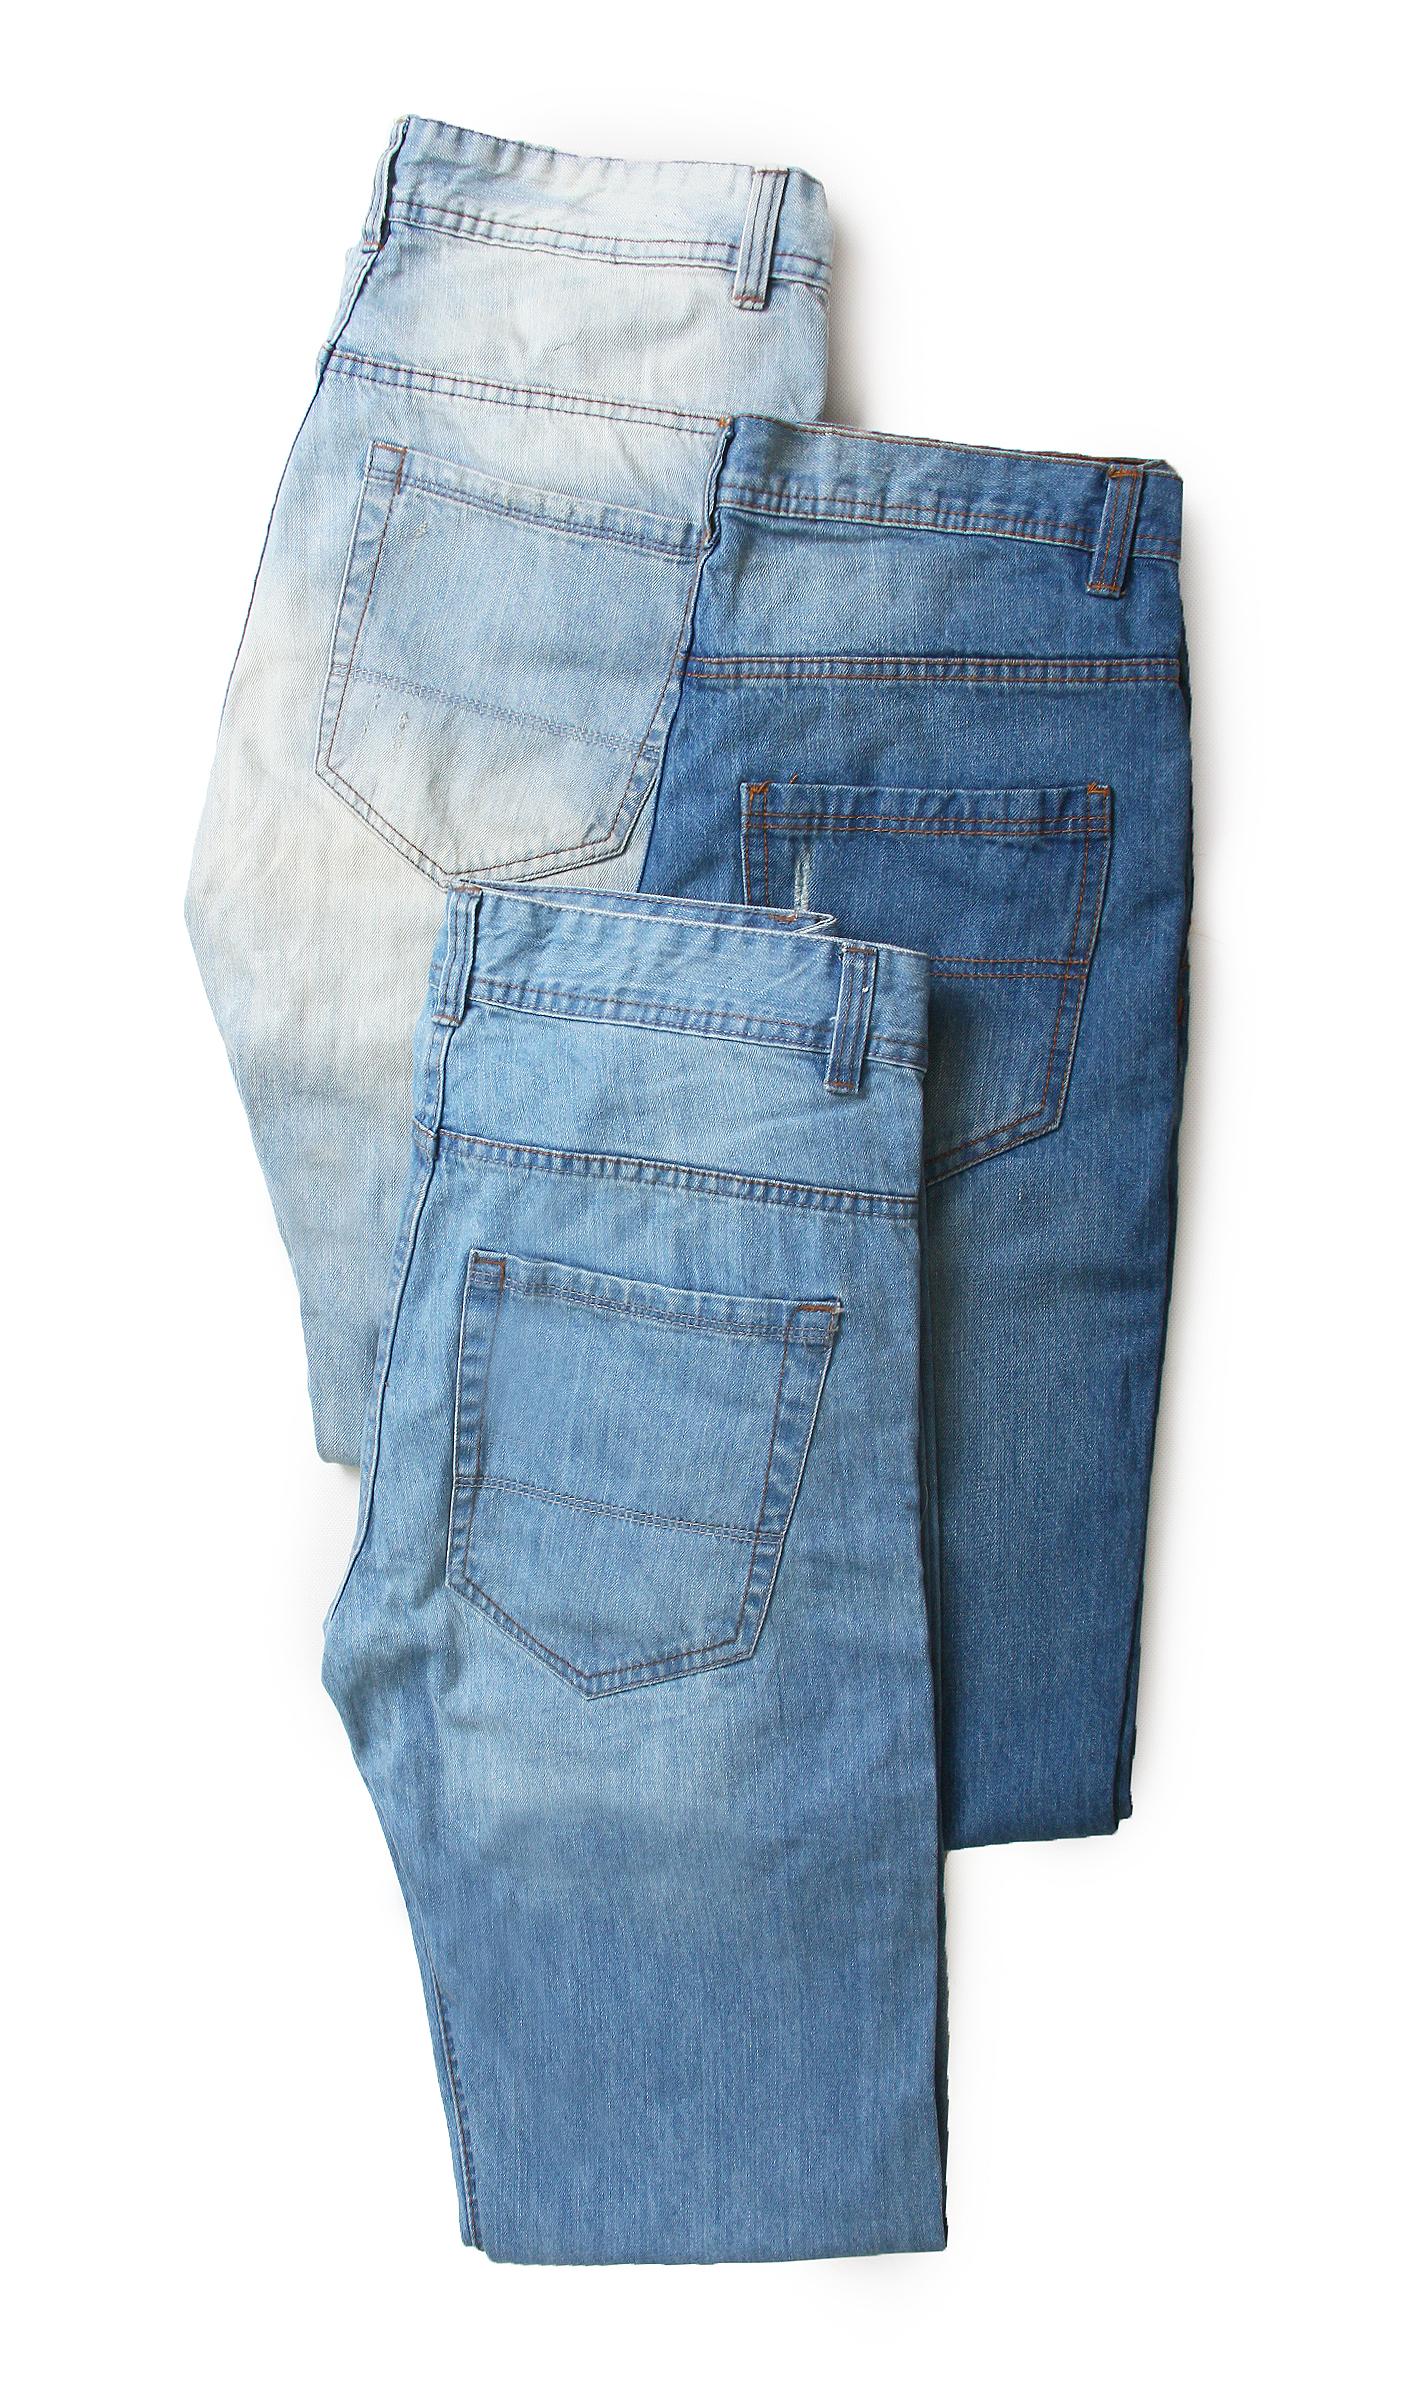 Shop Phan_3t Hàng VNXK origianal !!Zara,celio,nautica,raul lauren...Giá tốt nhất!! - 10